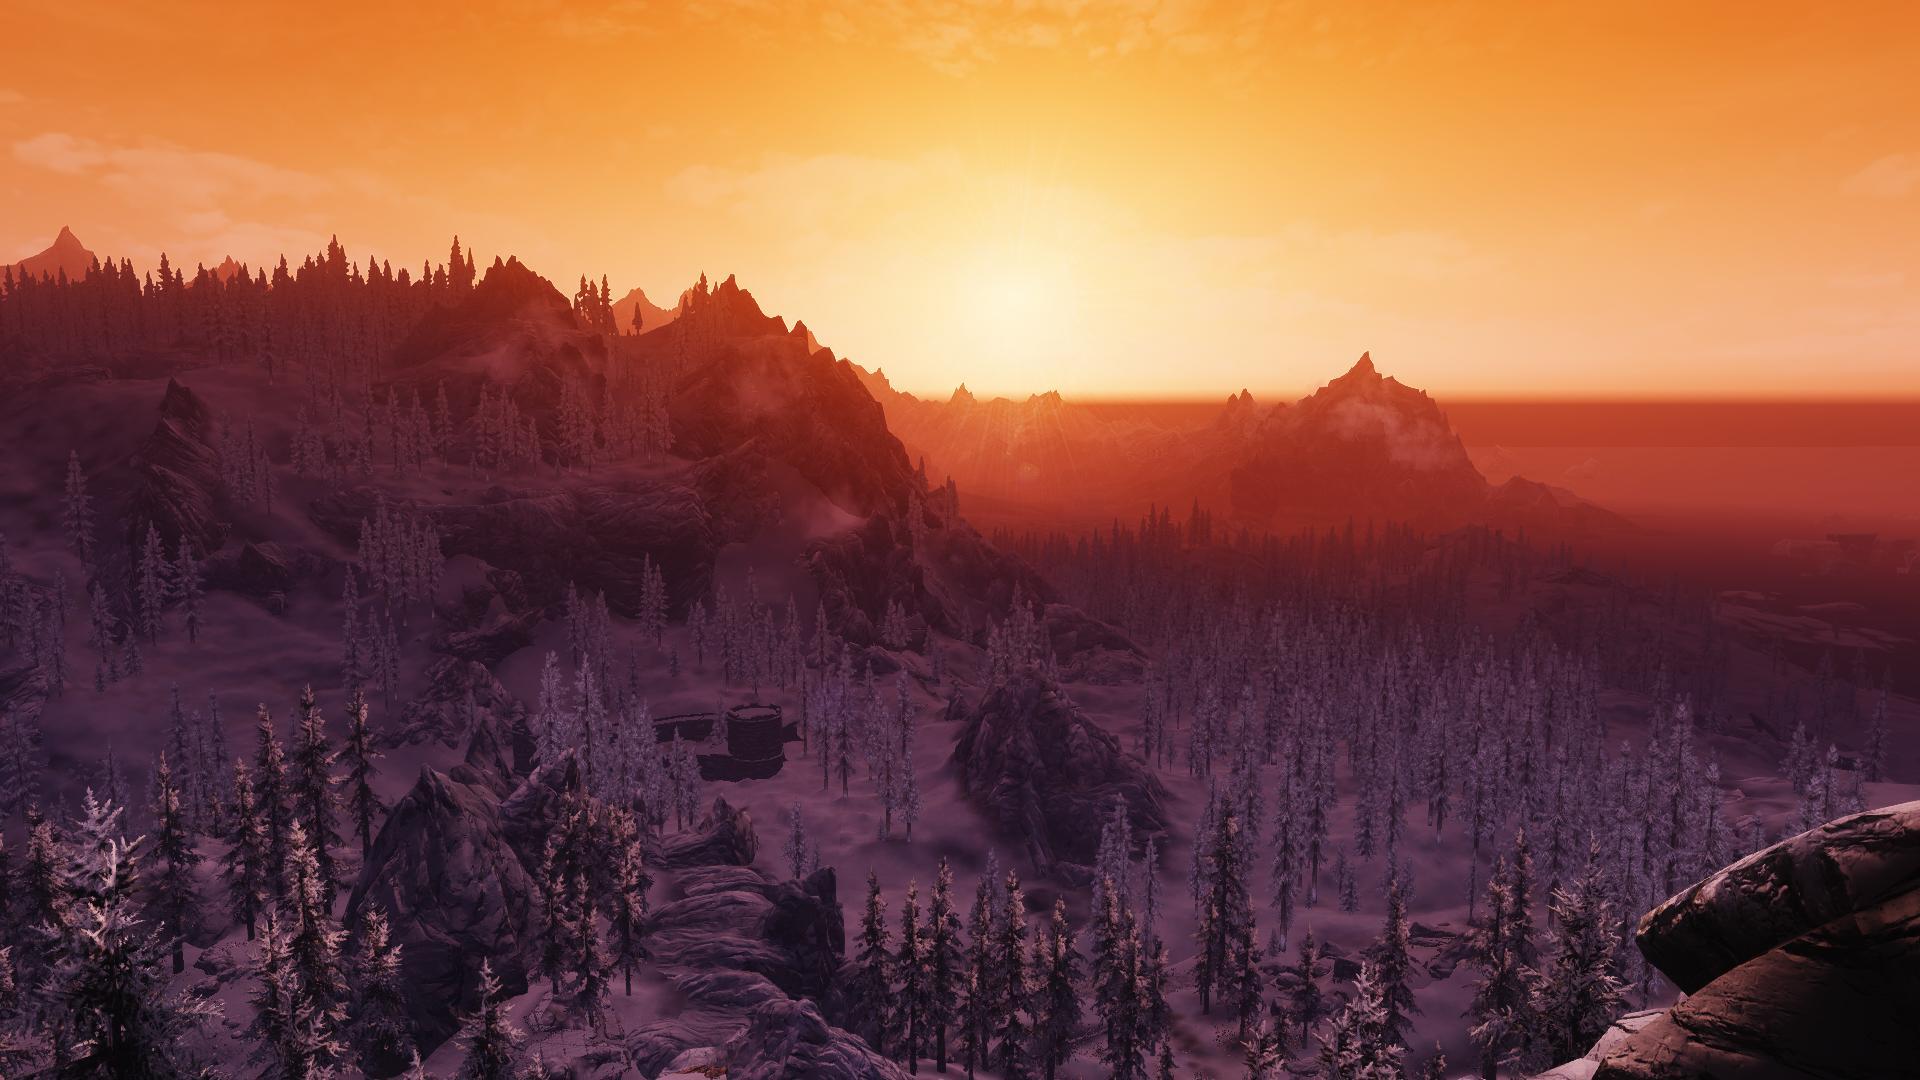 000782.Jpg - Elder Scrolls 5: Skyrim, the